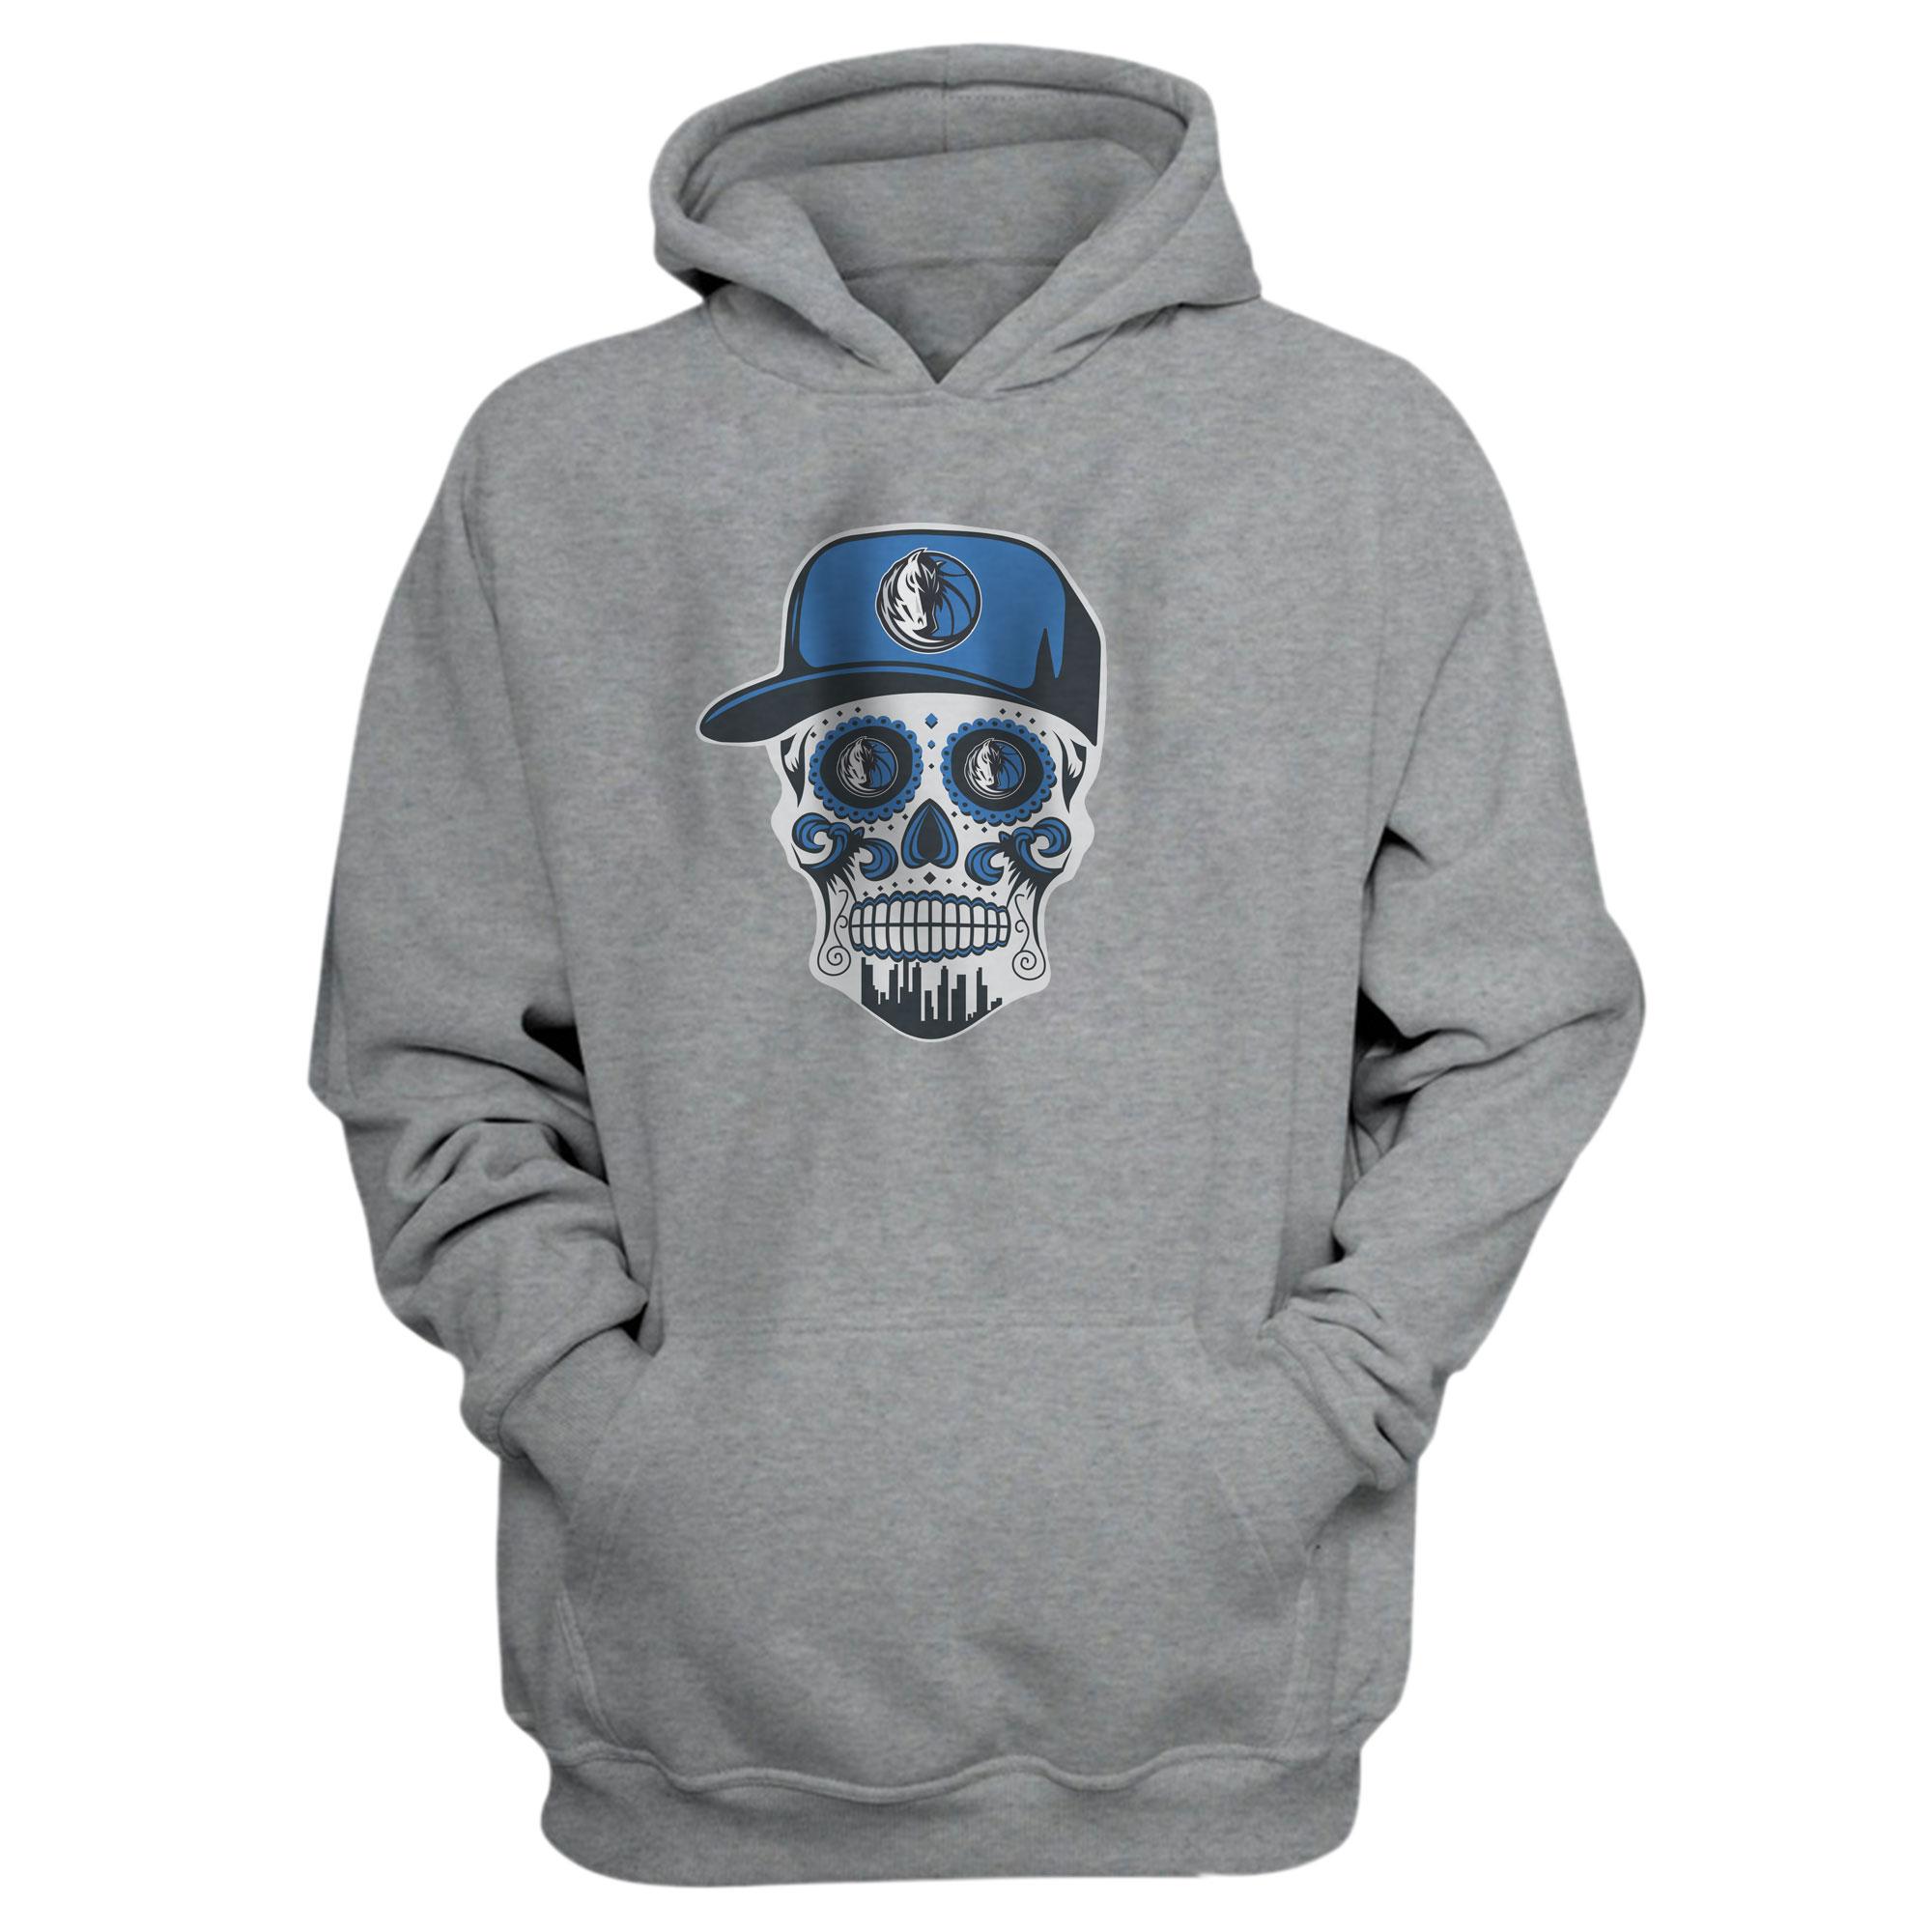 Dallas Skull Hoodie (HD-GRY-NP-451-NBA-DLS-SKULL)